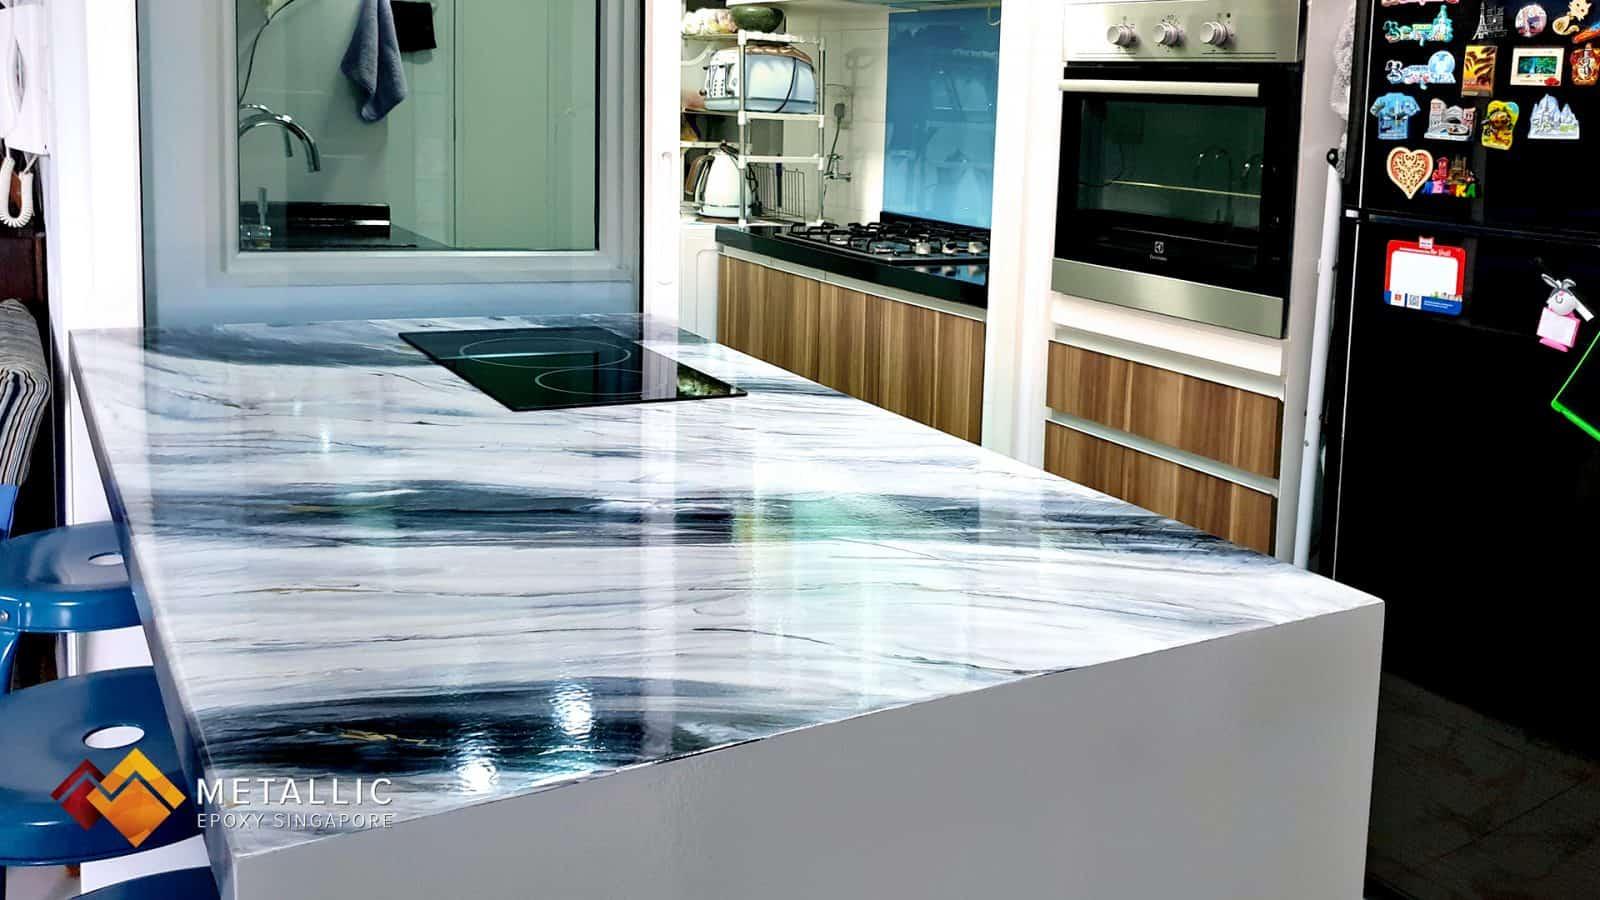 epoxy coated black silver countertop